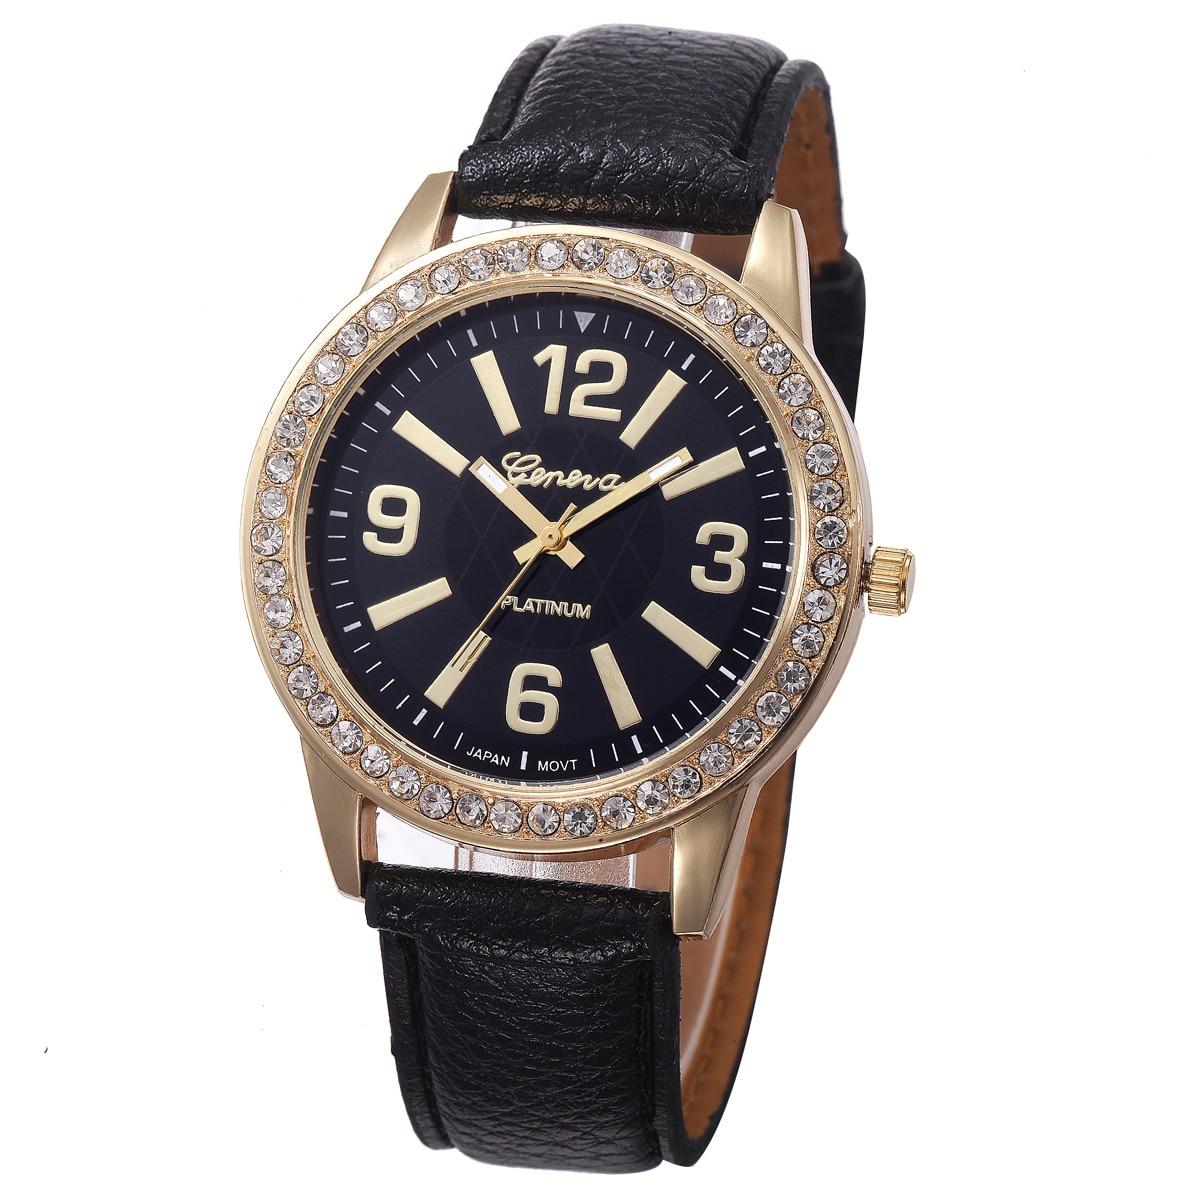 Ladies Women's Watch Crystal Inlay Quartz WristWatch relogio feminino reloj mujer zegarek damski montre femme часы жнские saat